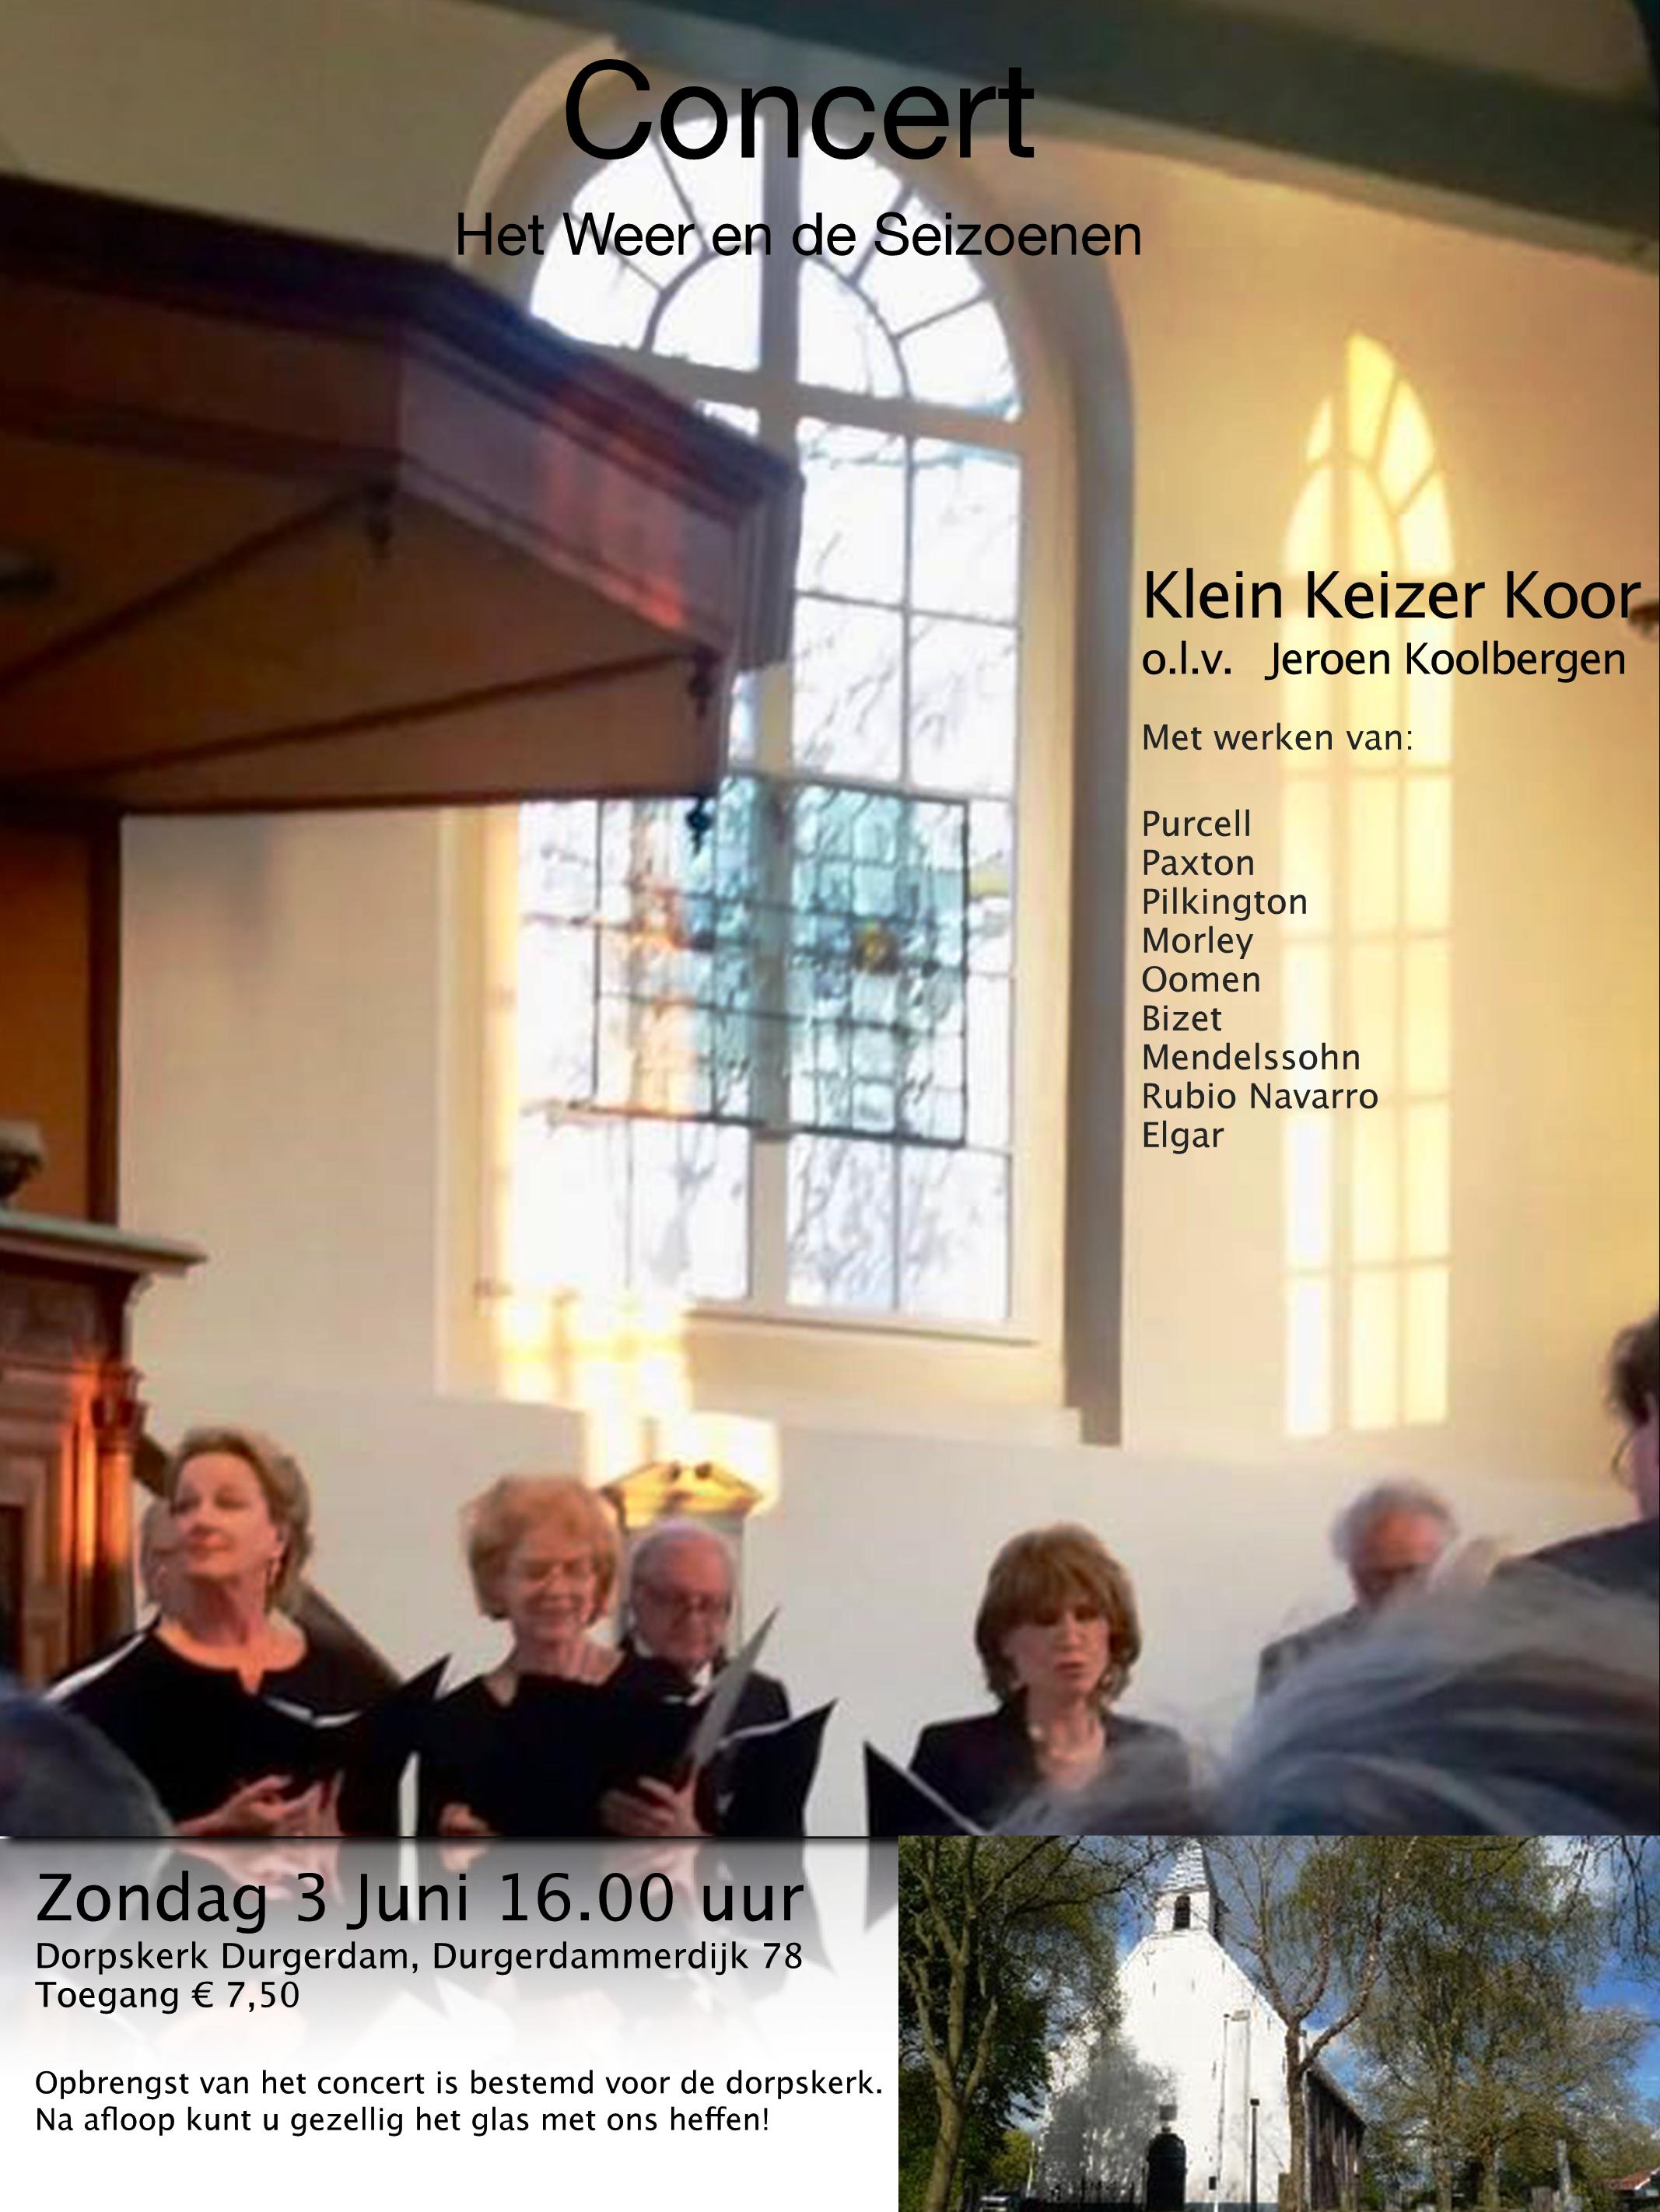 Klein Keizer koor treedt op in Durgerdam!